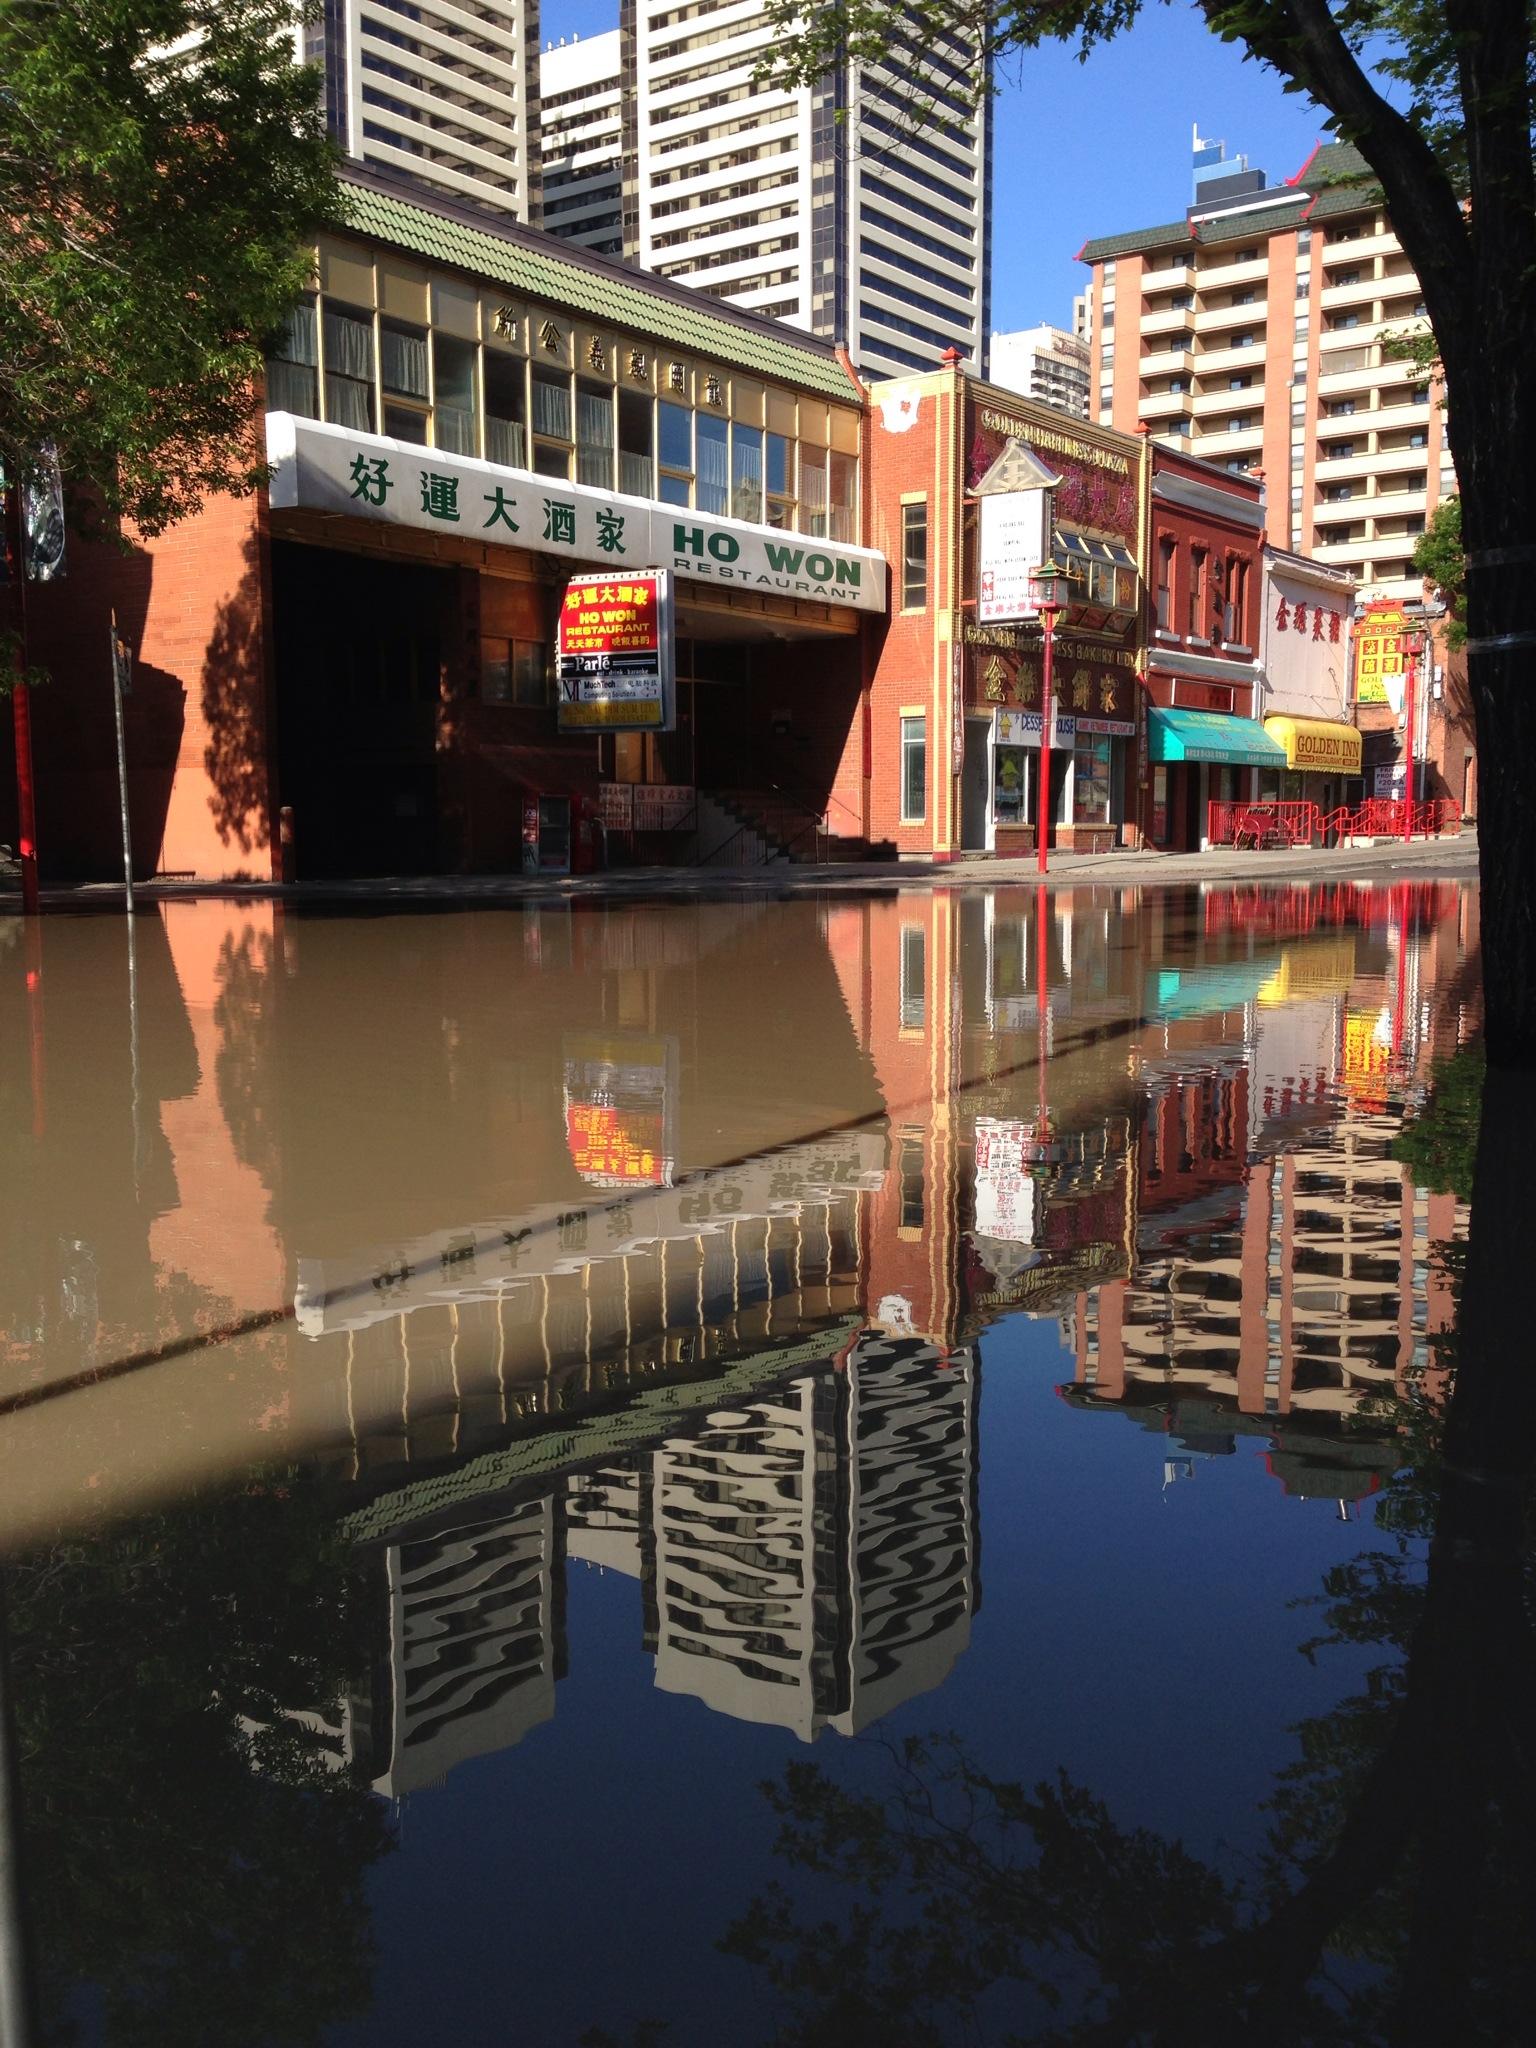 calgary-chinatown-flood-2013-lwwa